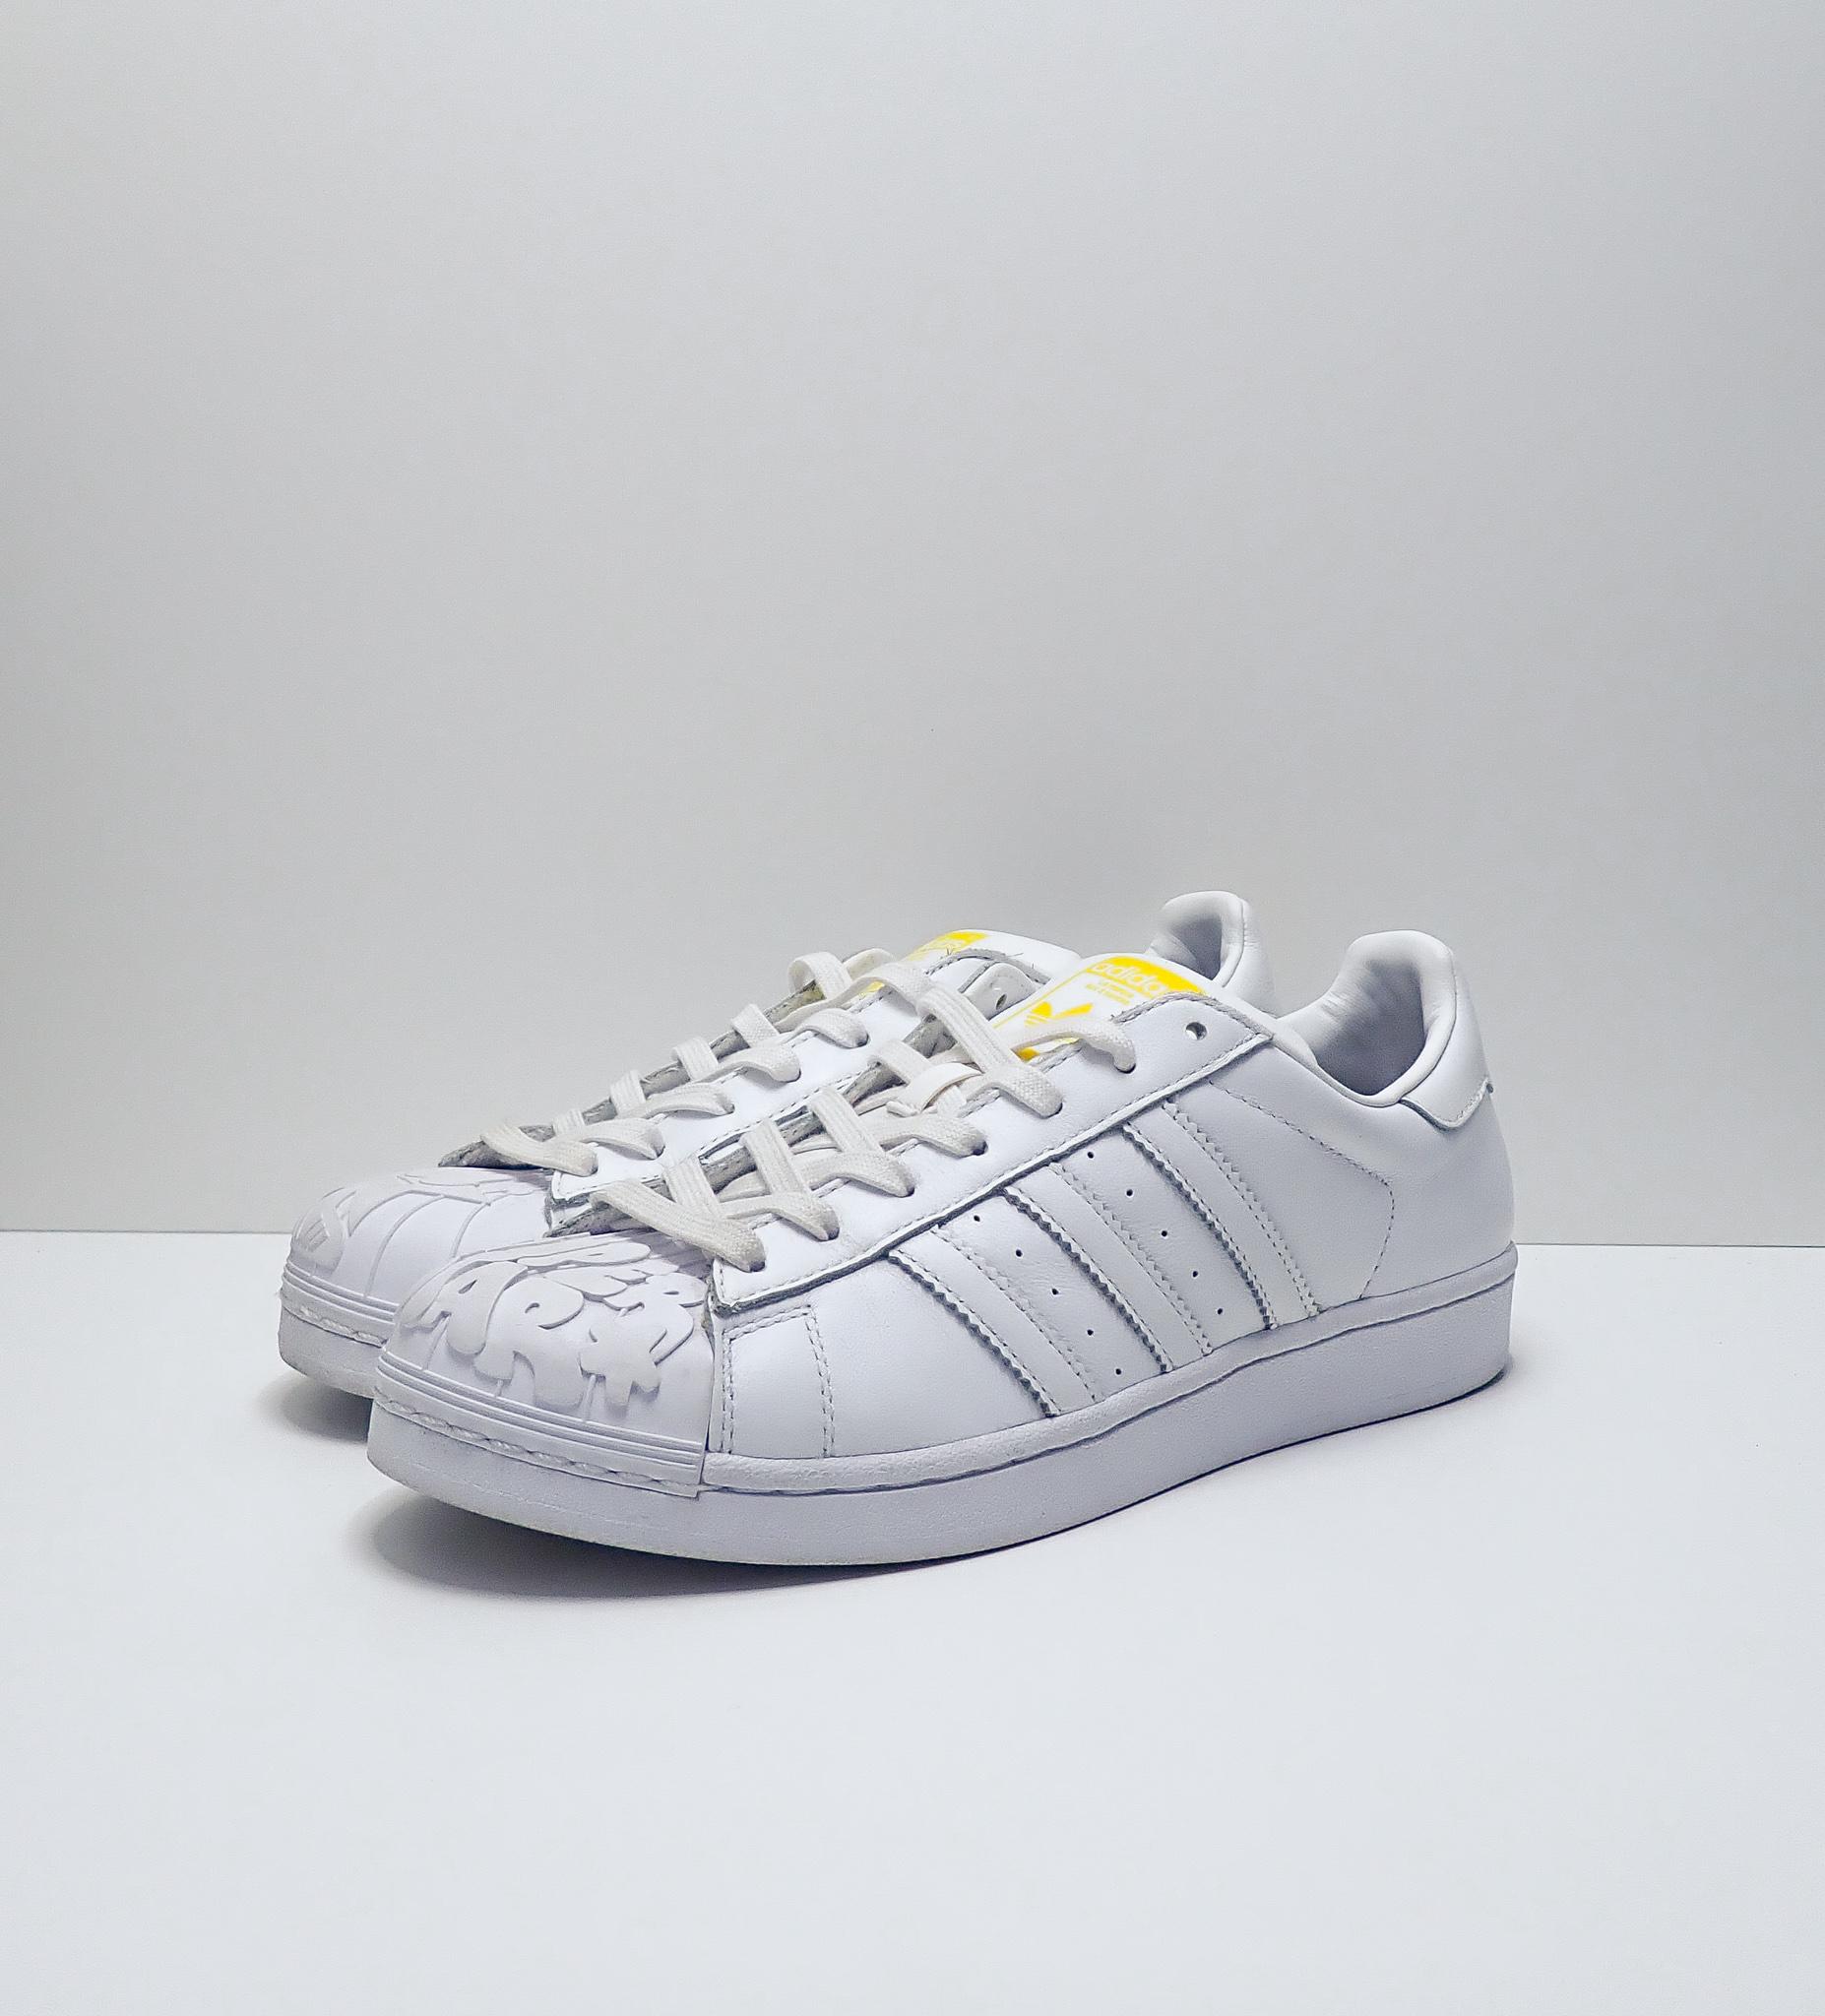 Adidas Superstar Pharrell Supershell